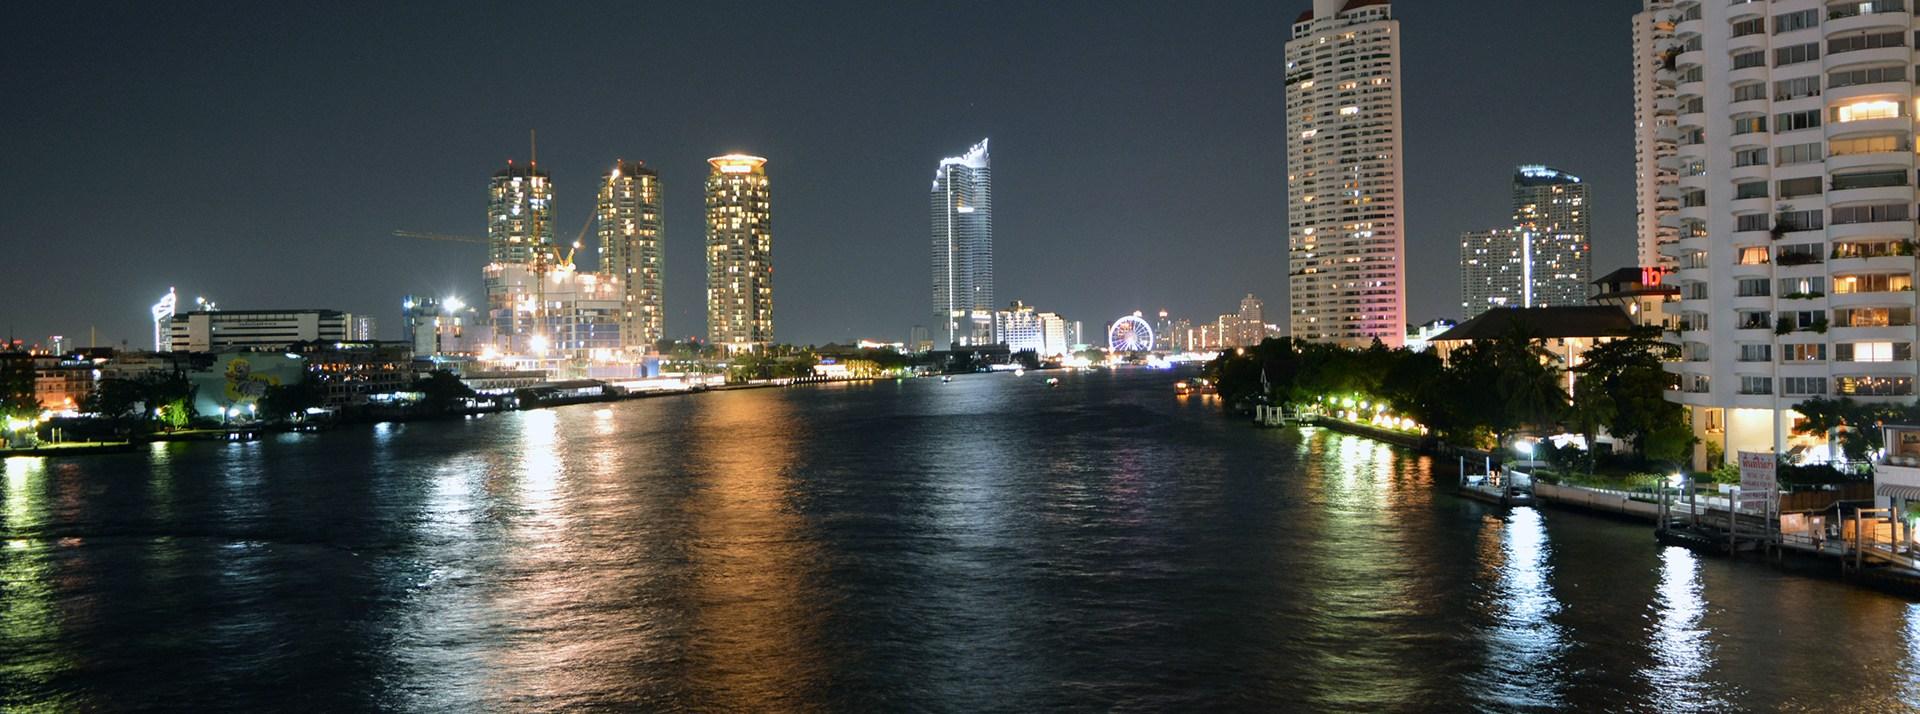 One night in Bangkok, Thailand